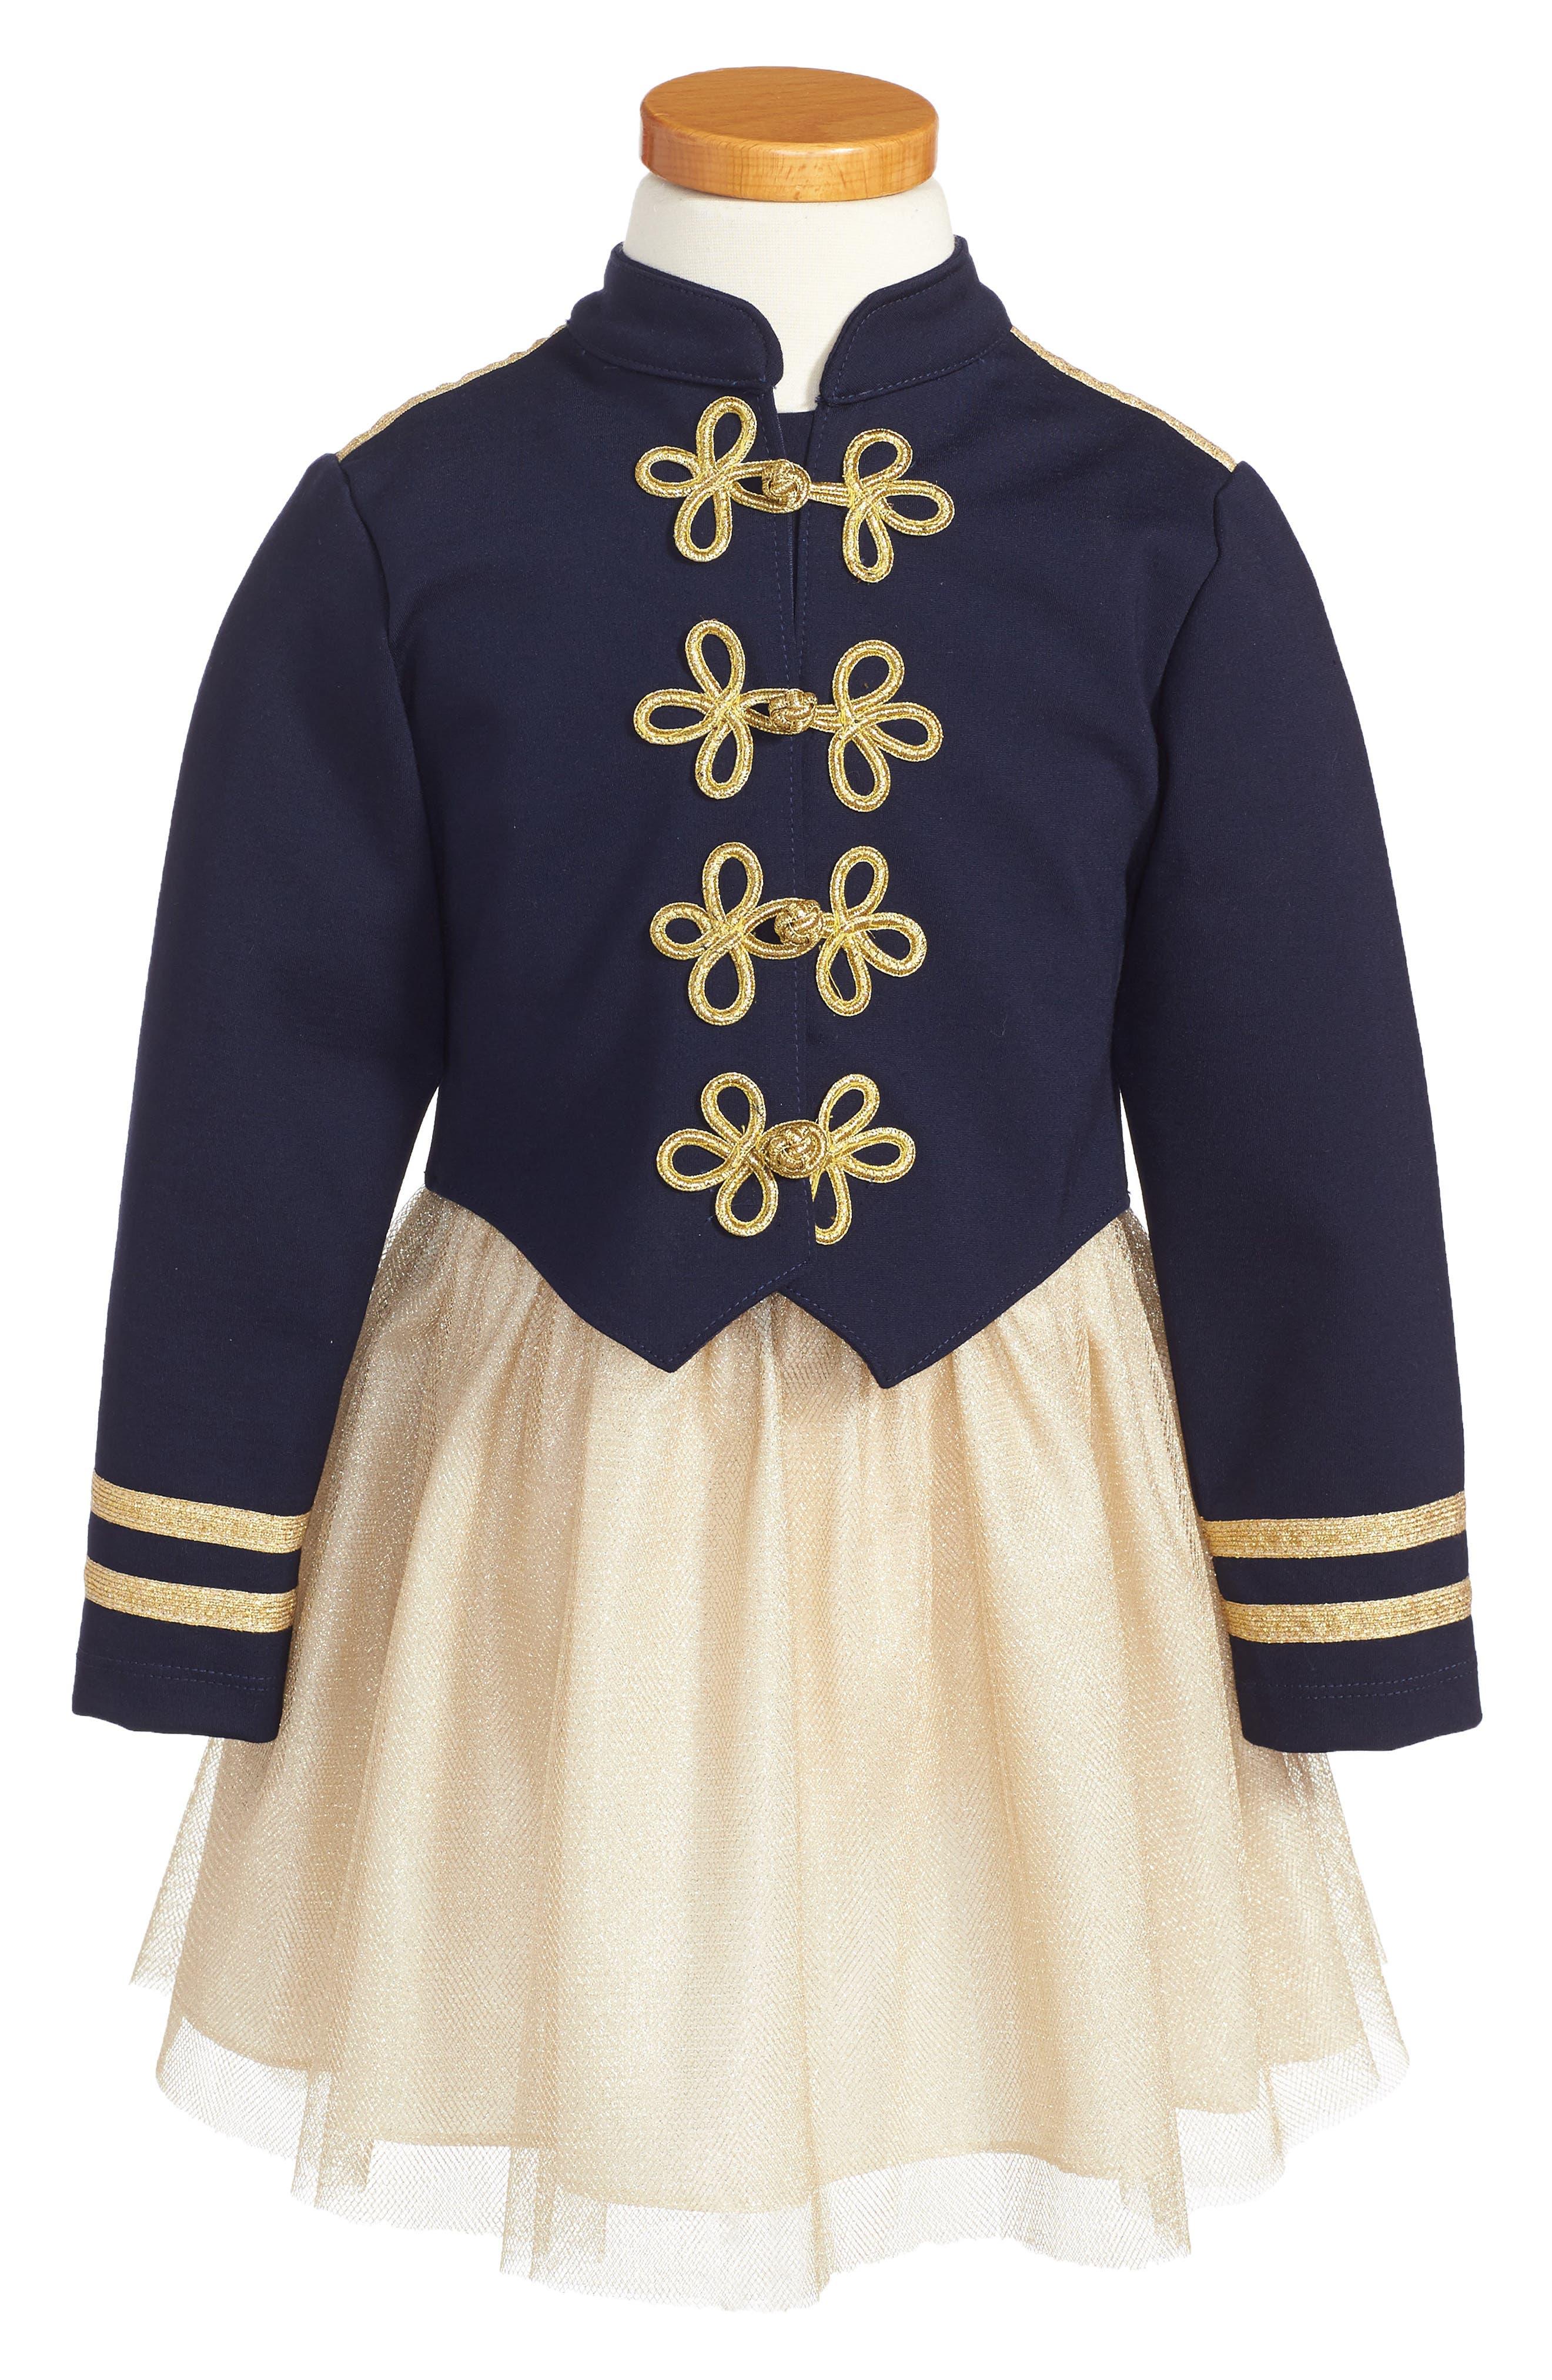 Majorette Jacket & Tank Dress Set,                         Main,                         color, Navy/ Gold